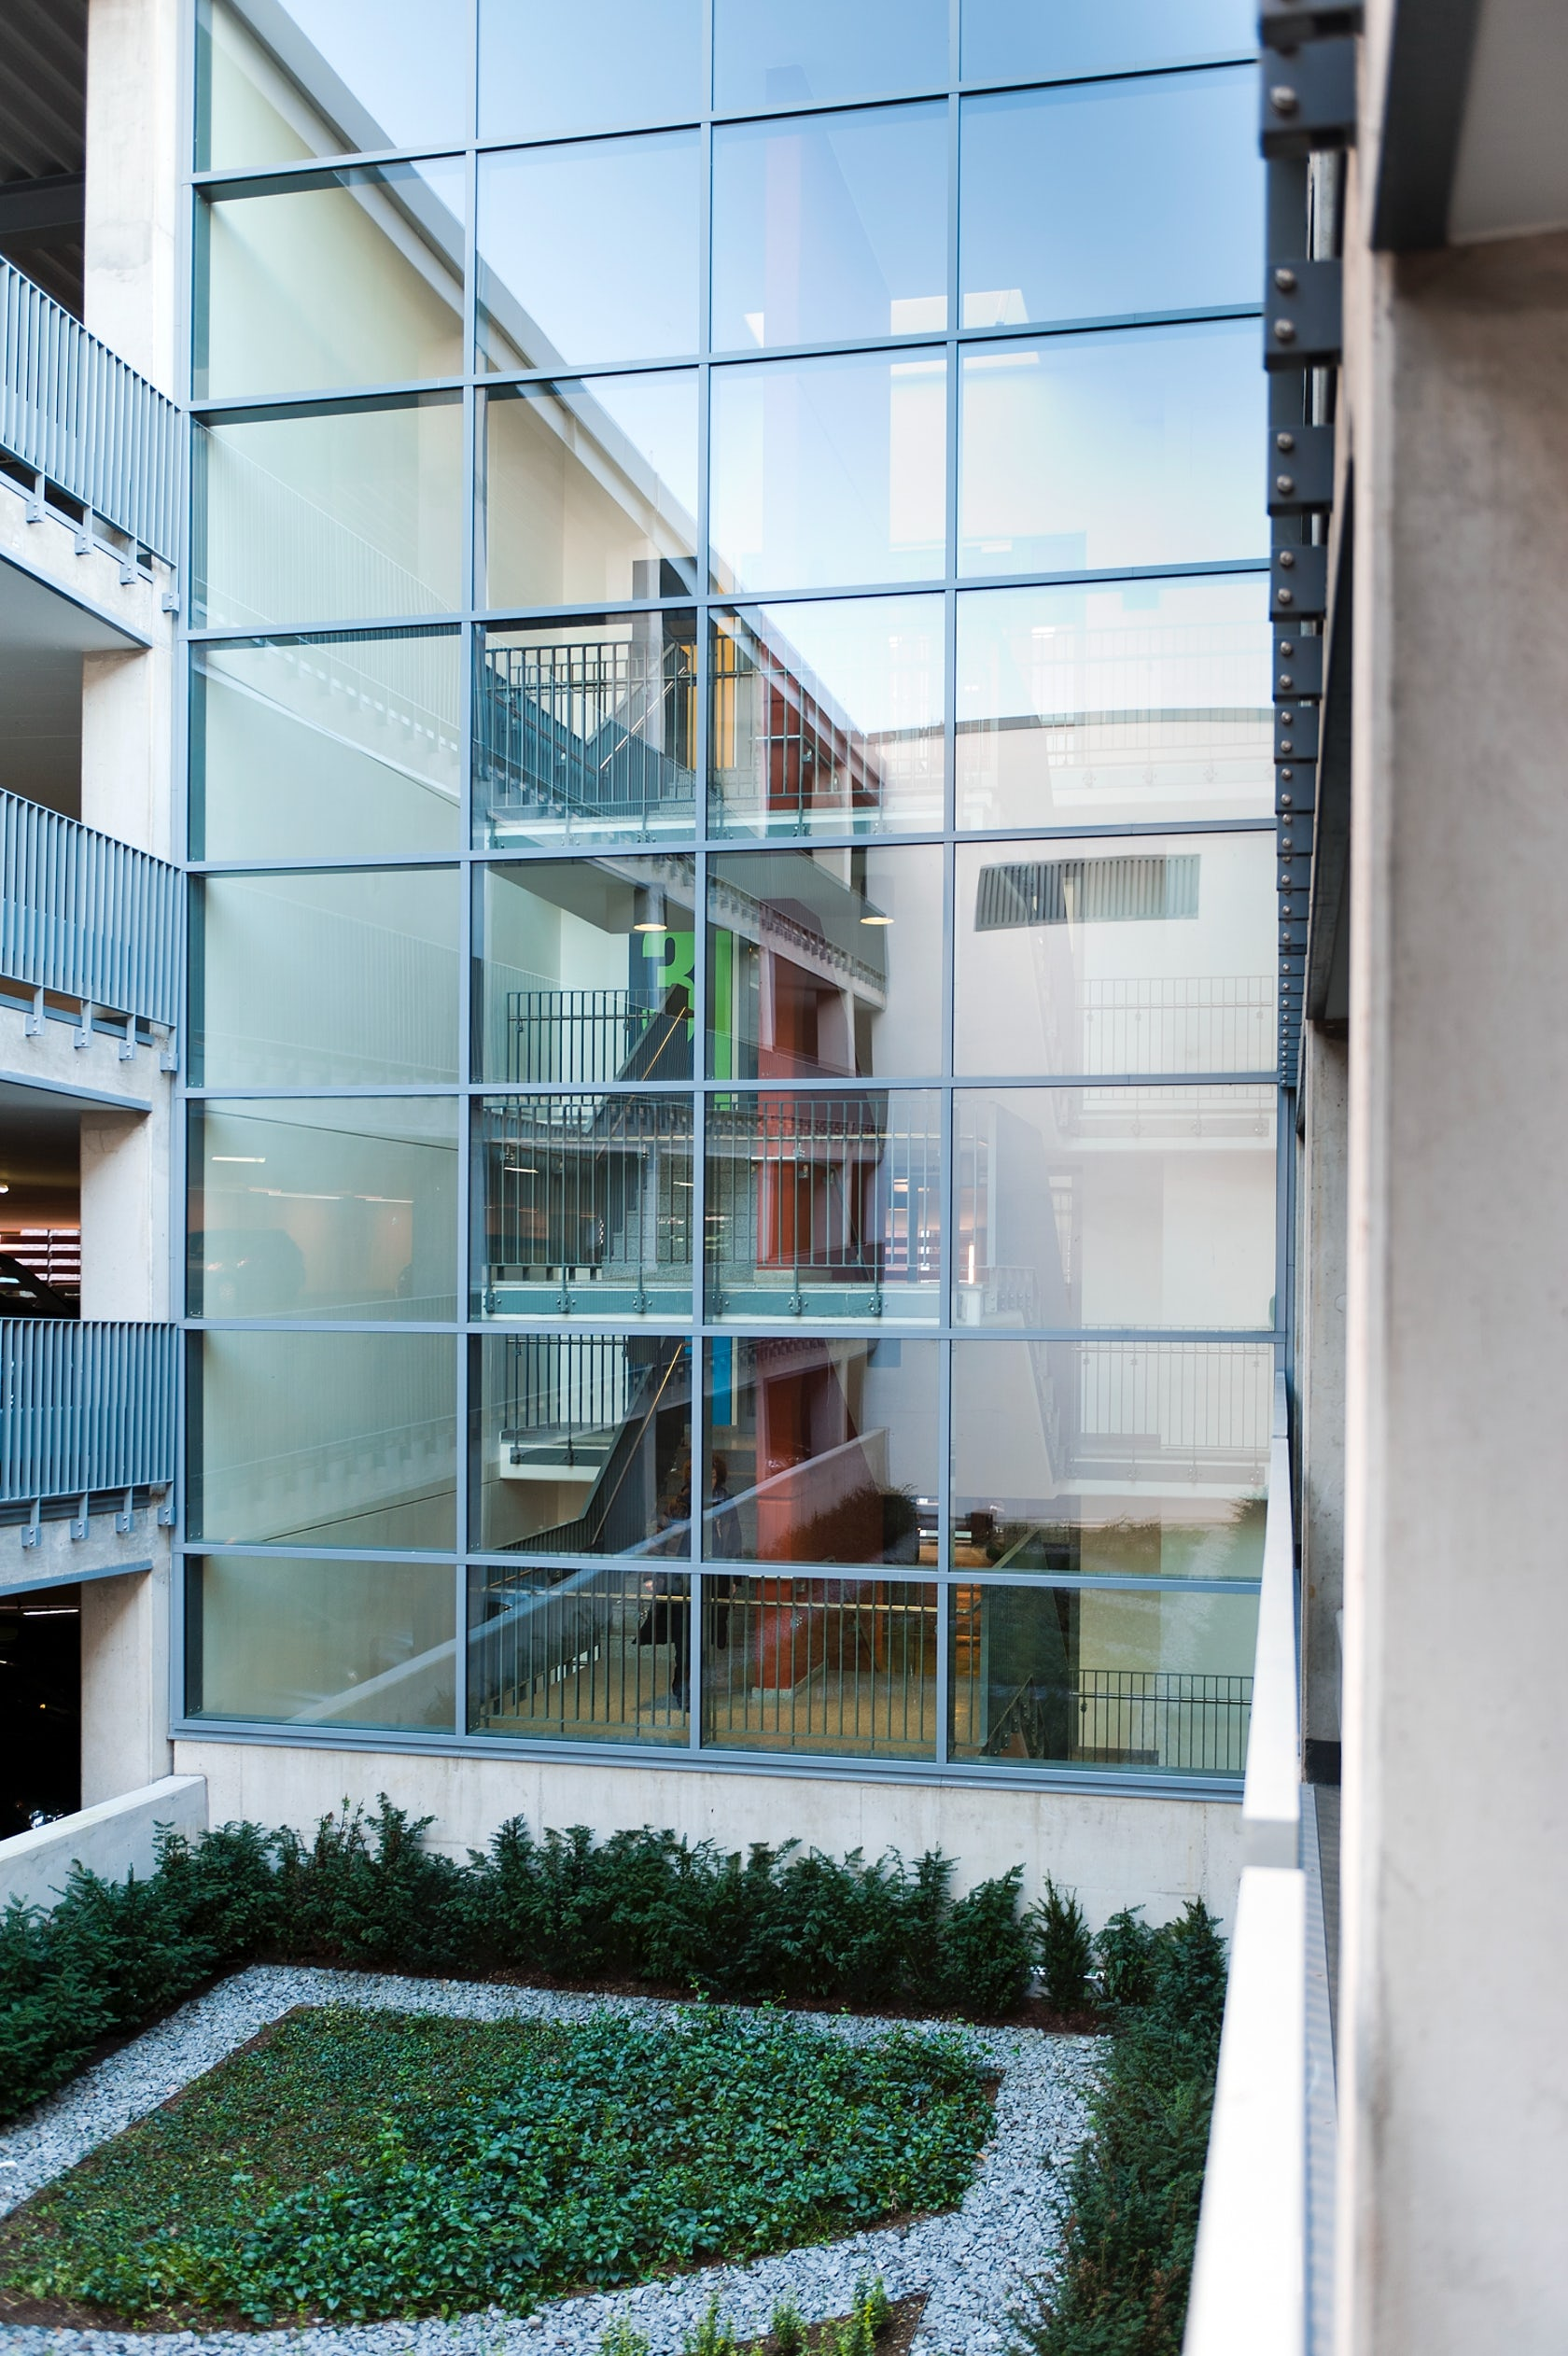 parkhaus alter steinweg architizer. Black Bedroom Furniture Sets. Home Design Ideas